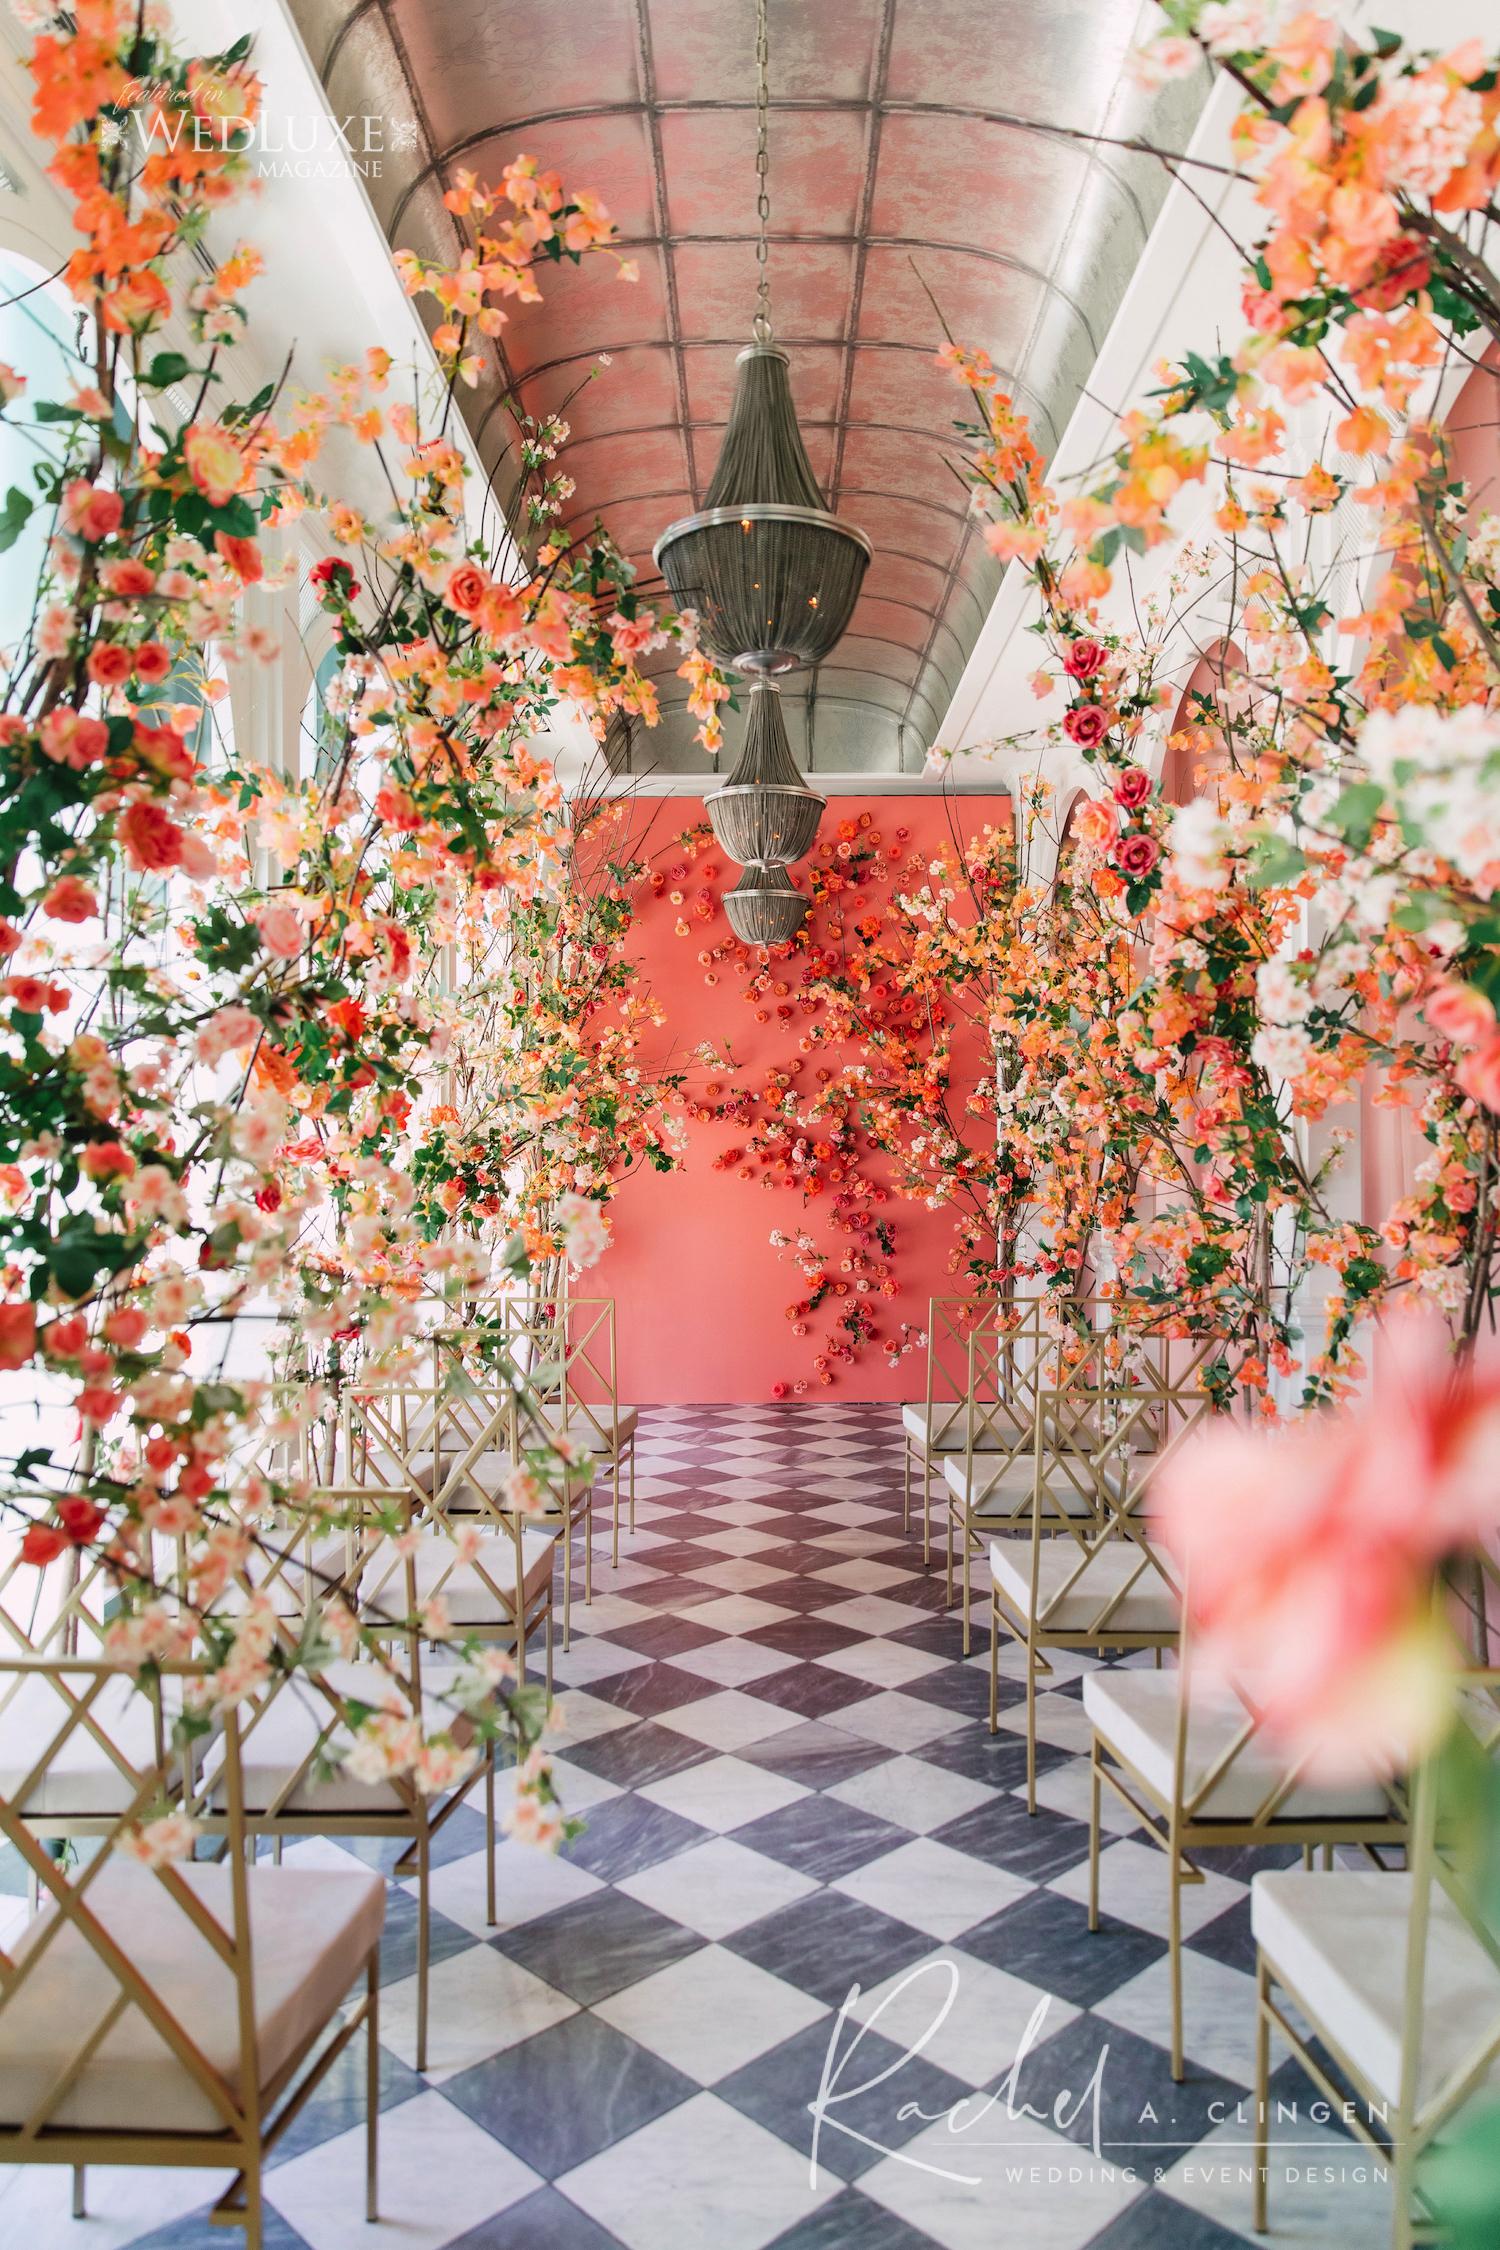 wedding designer coral rachel a clingen imp